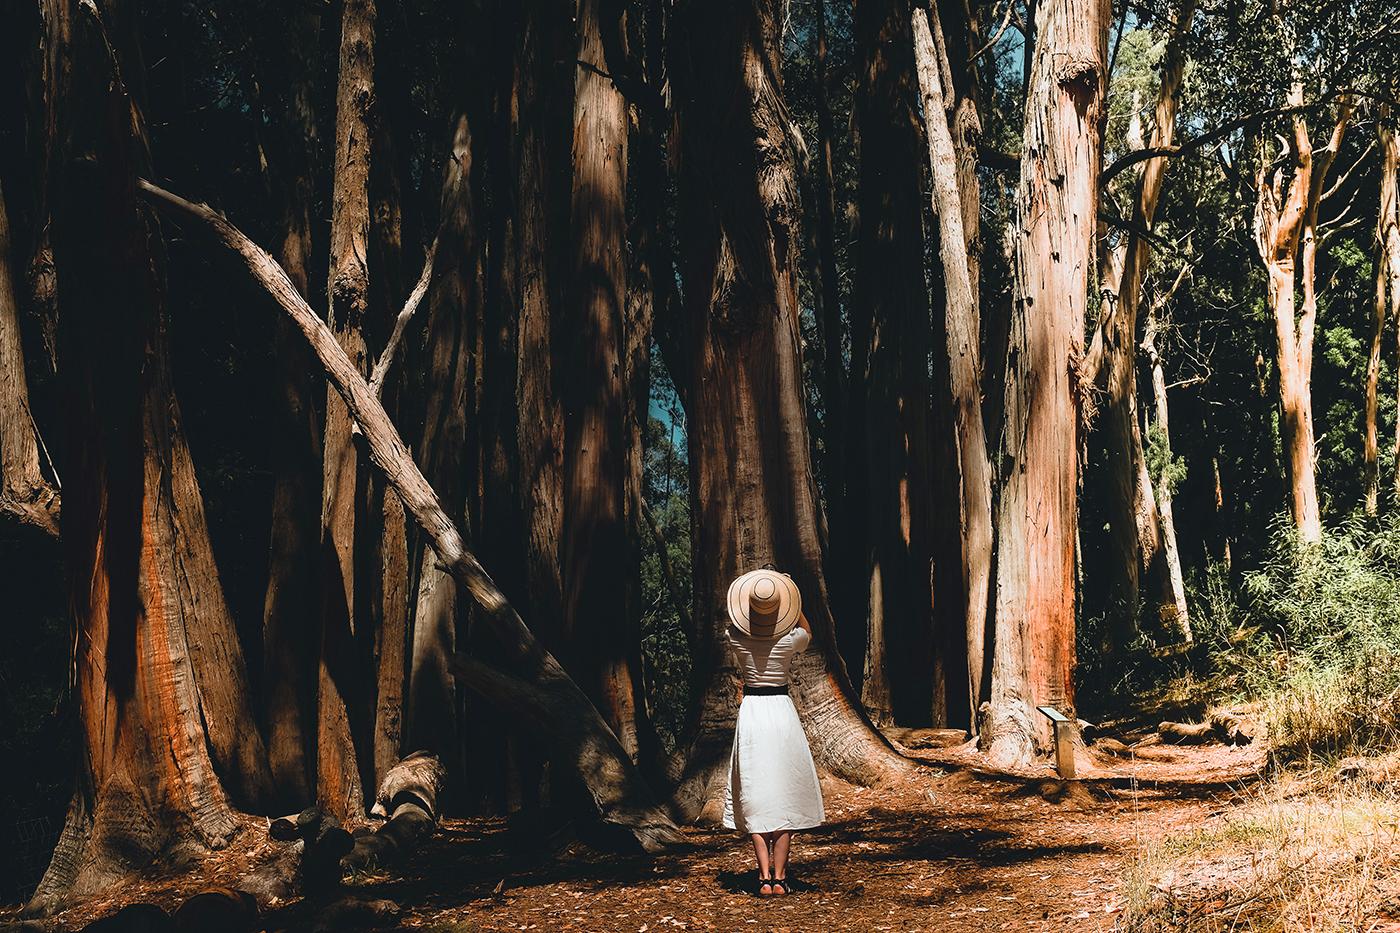 angie goes exploring honeymoon in 2½ itinerario di un mese in alaska e alle hawaii giorgia romiti maui haleakala